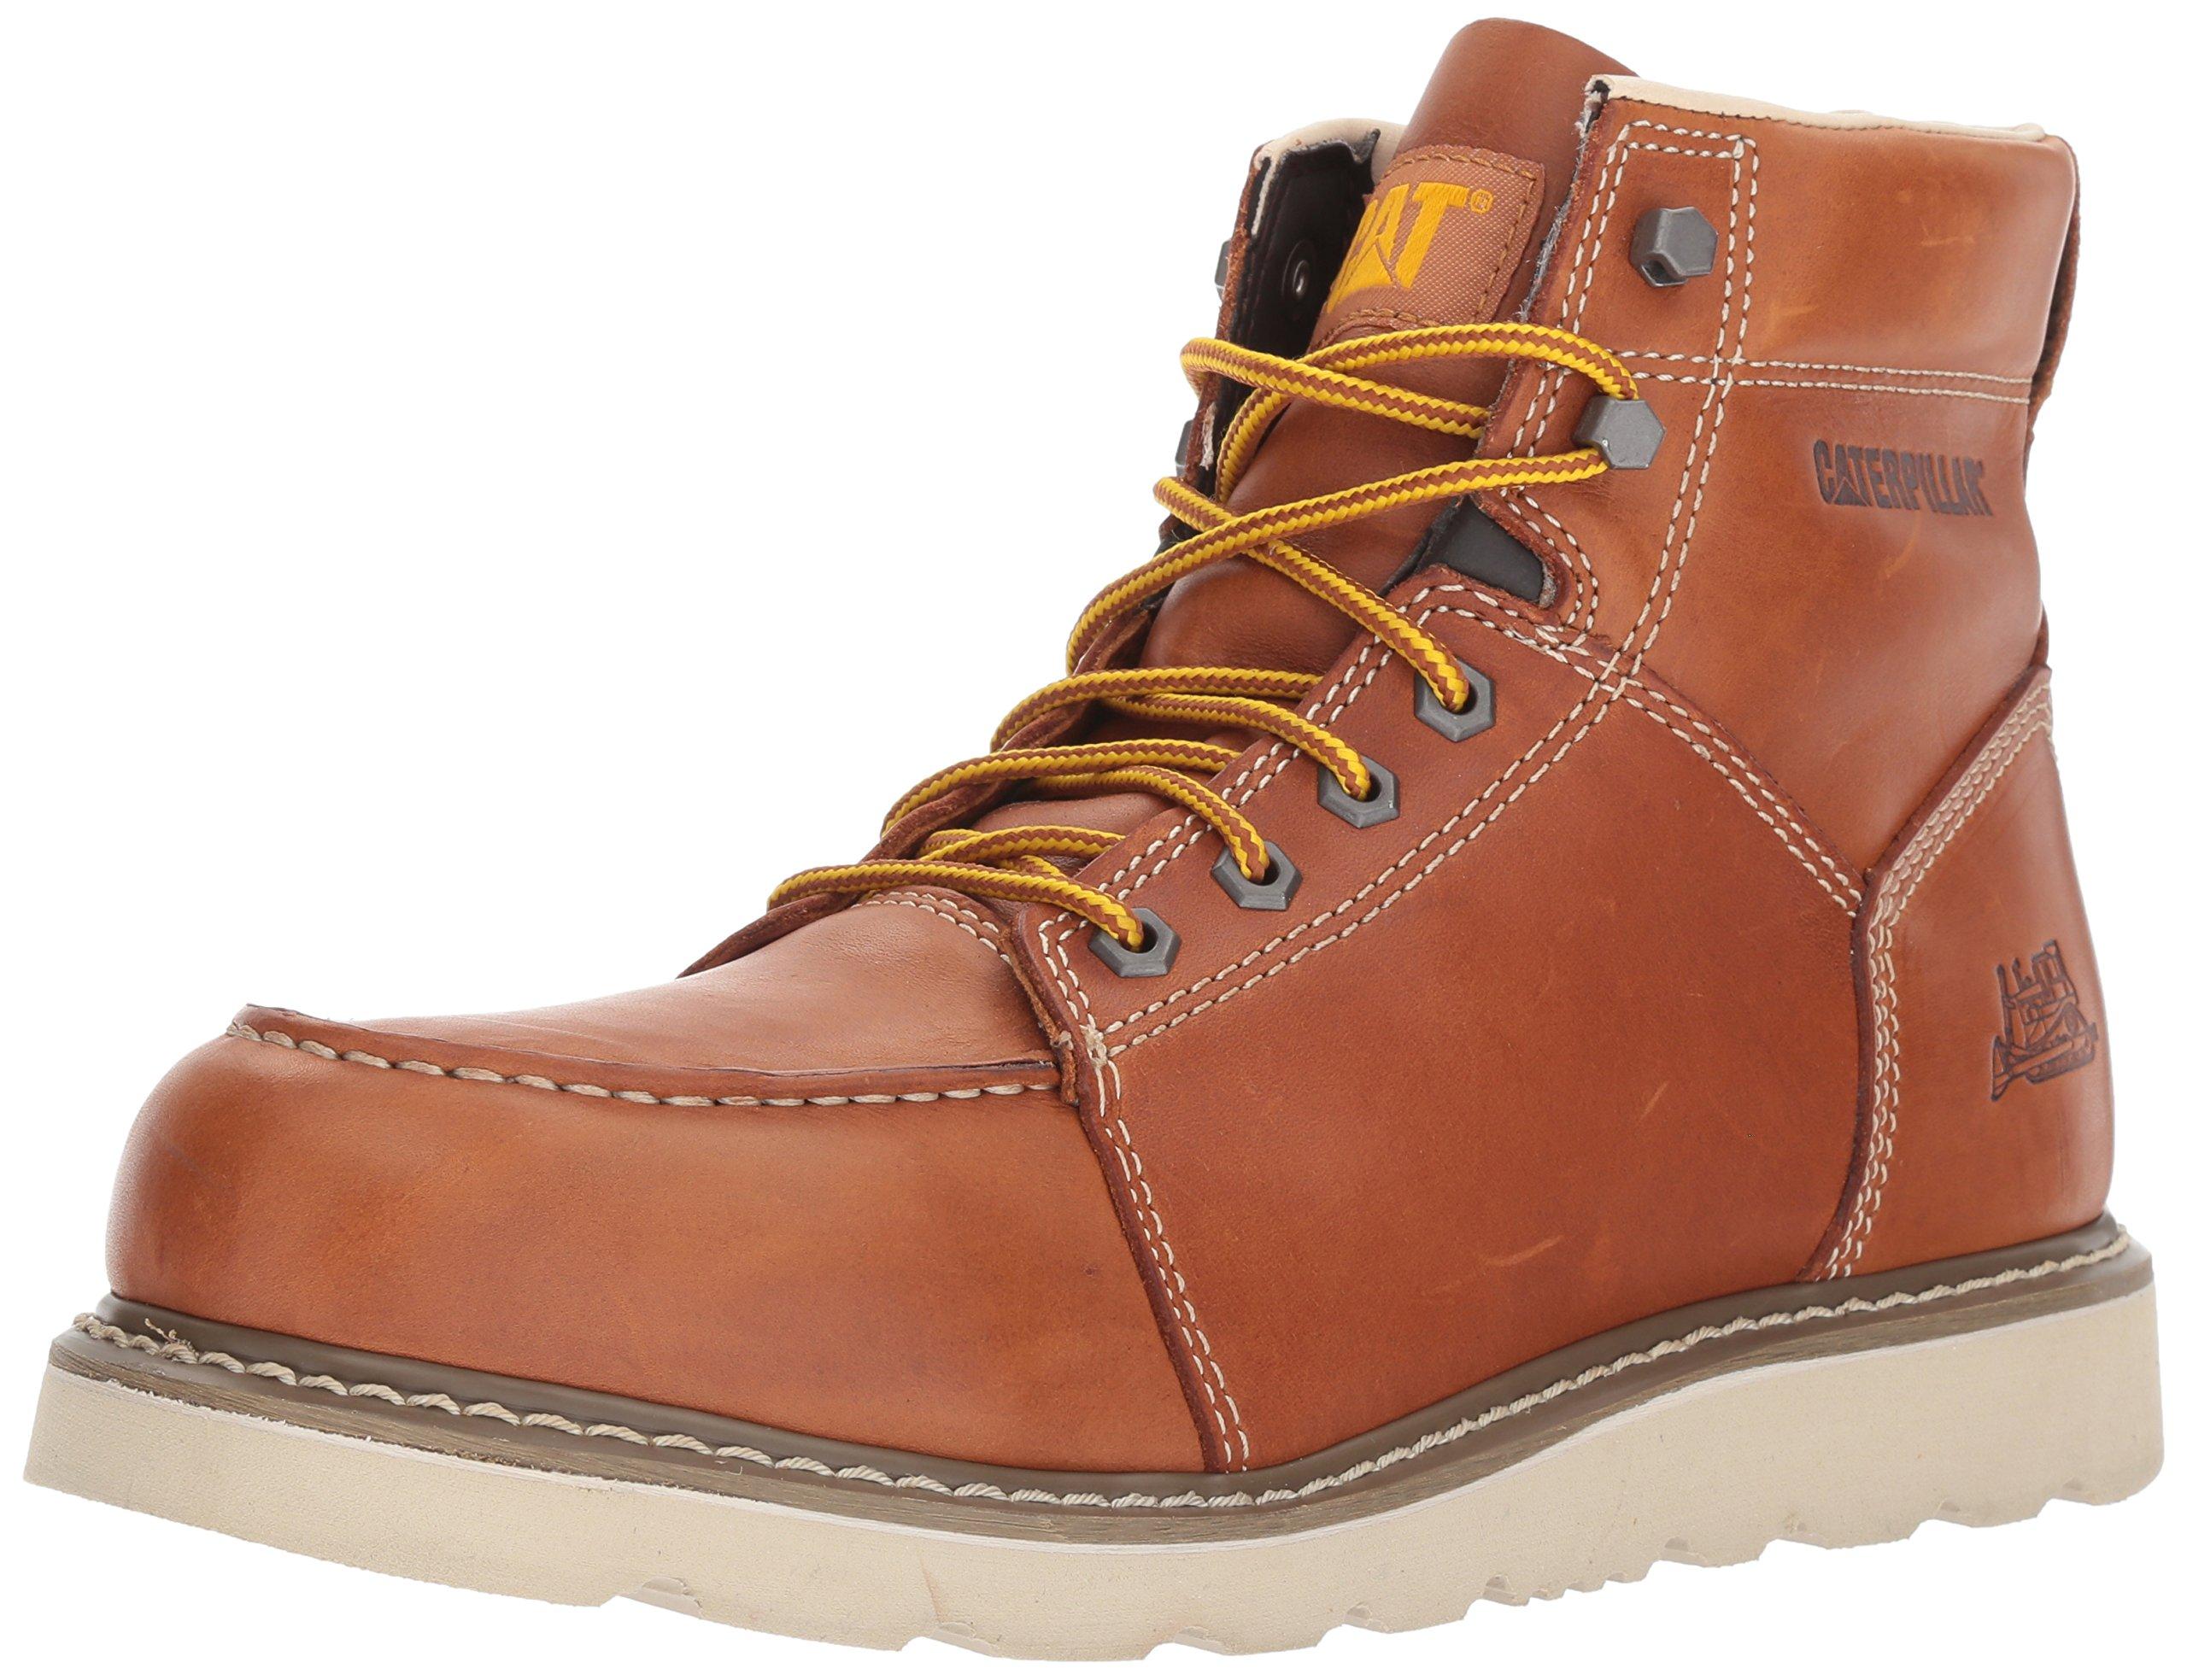 Caterpillar Men's Tradesman Industrial and Construction Shoe, Tan, 10.5 M US